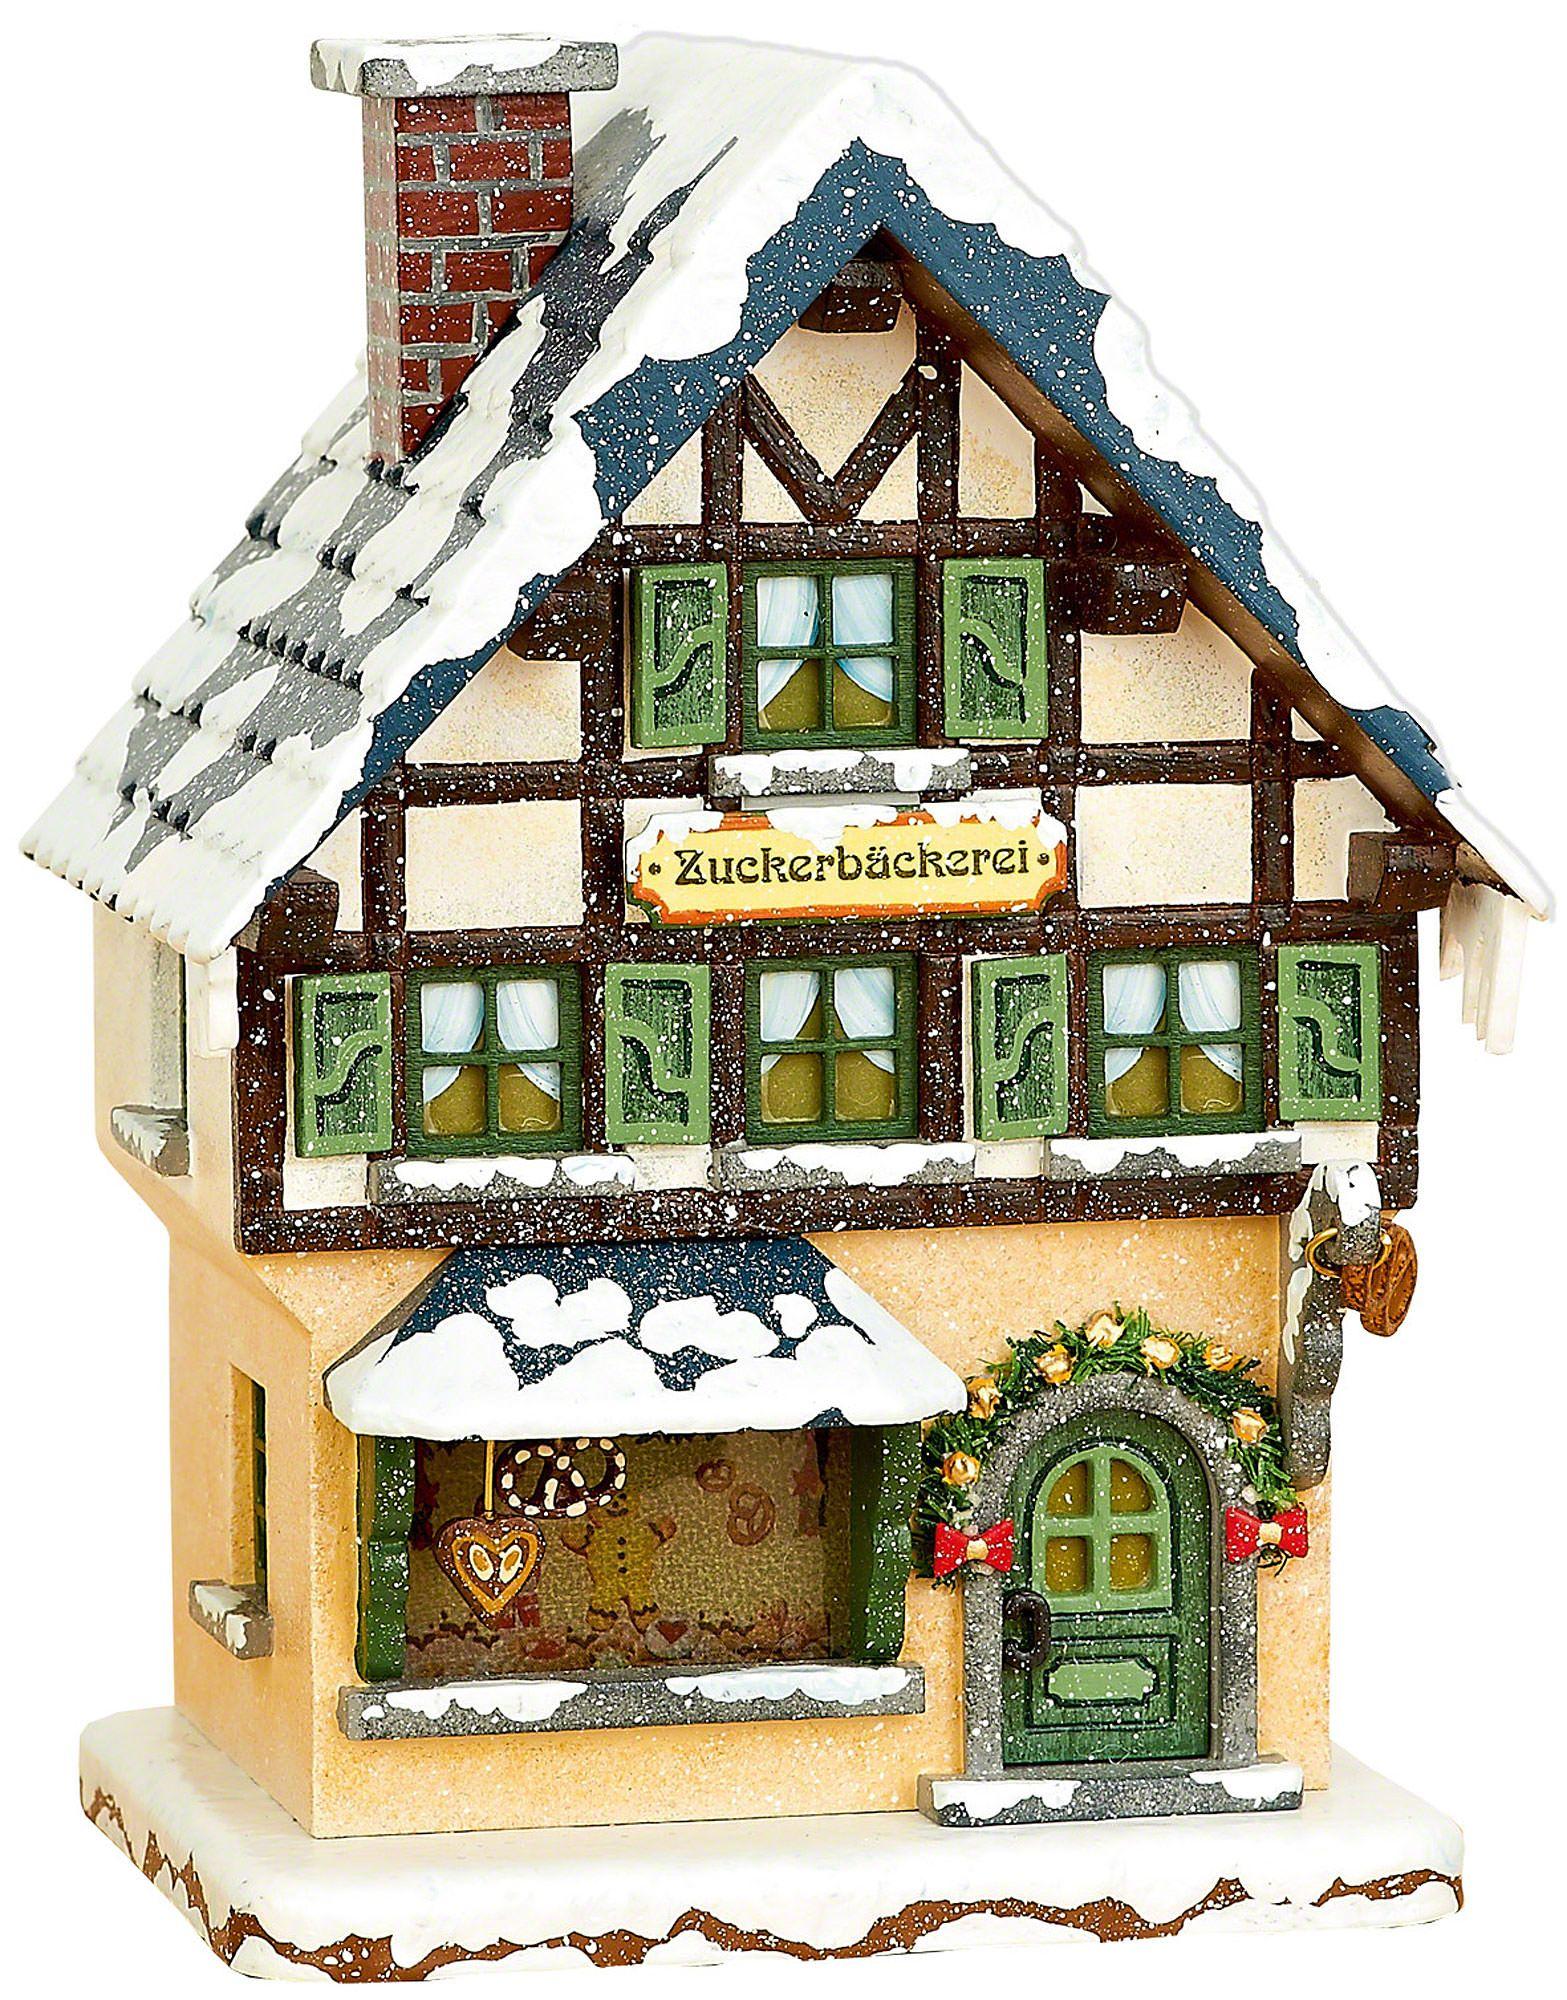 Winter children Sugar bakery illuminated (15cm/6in)ch by